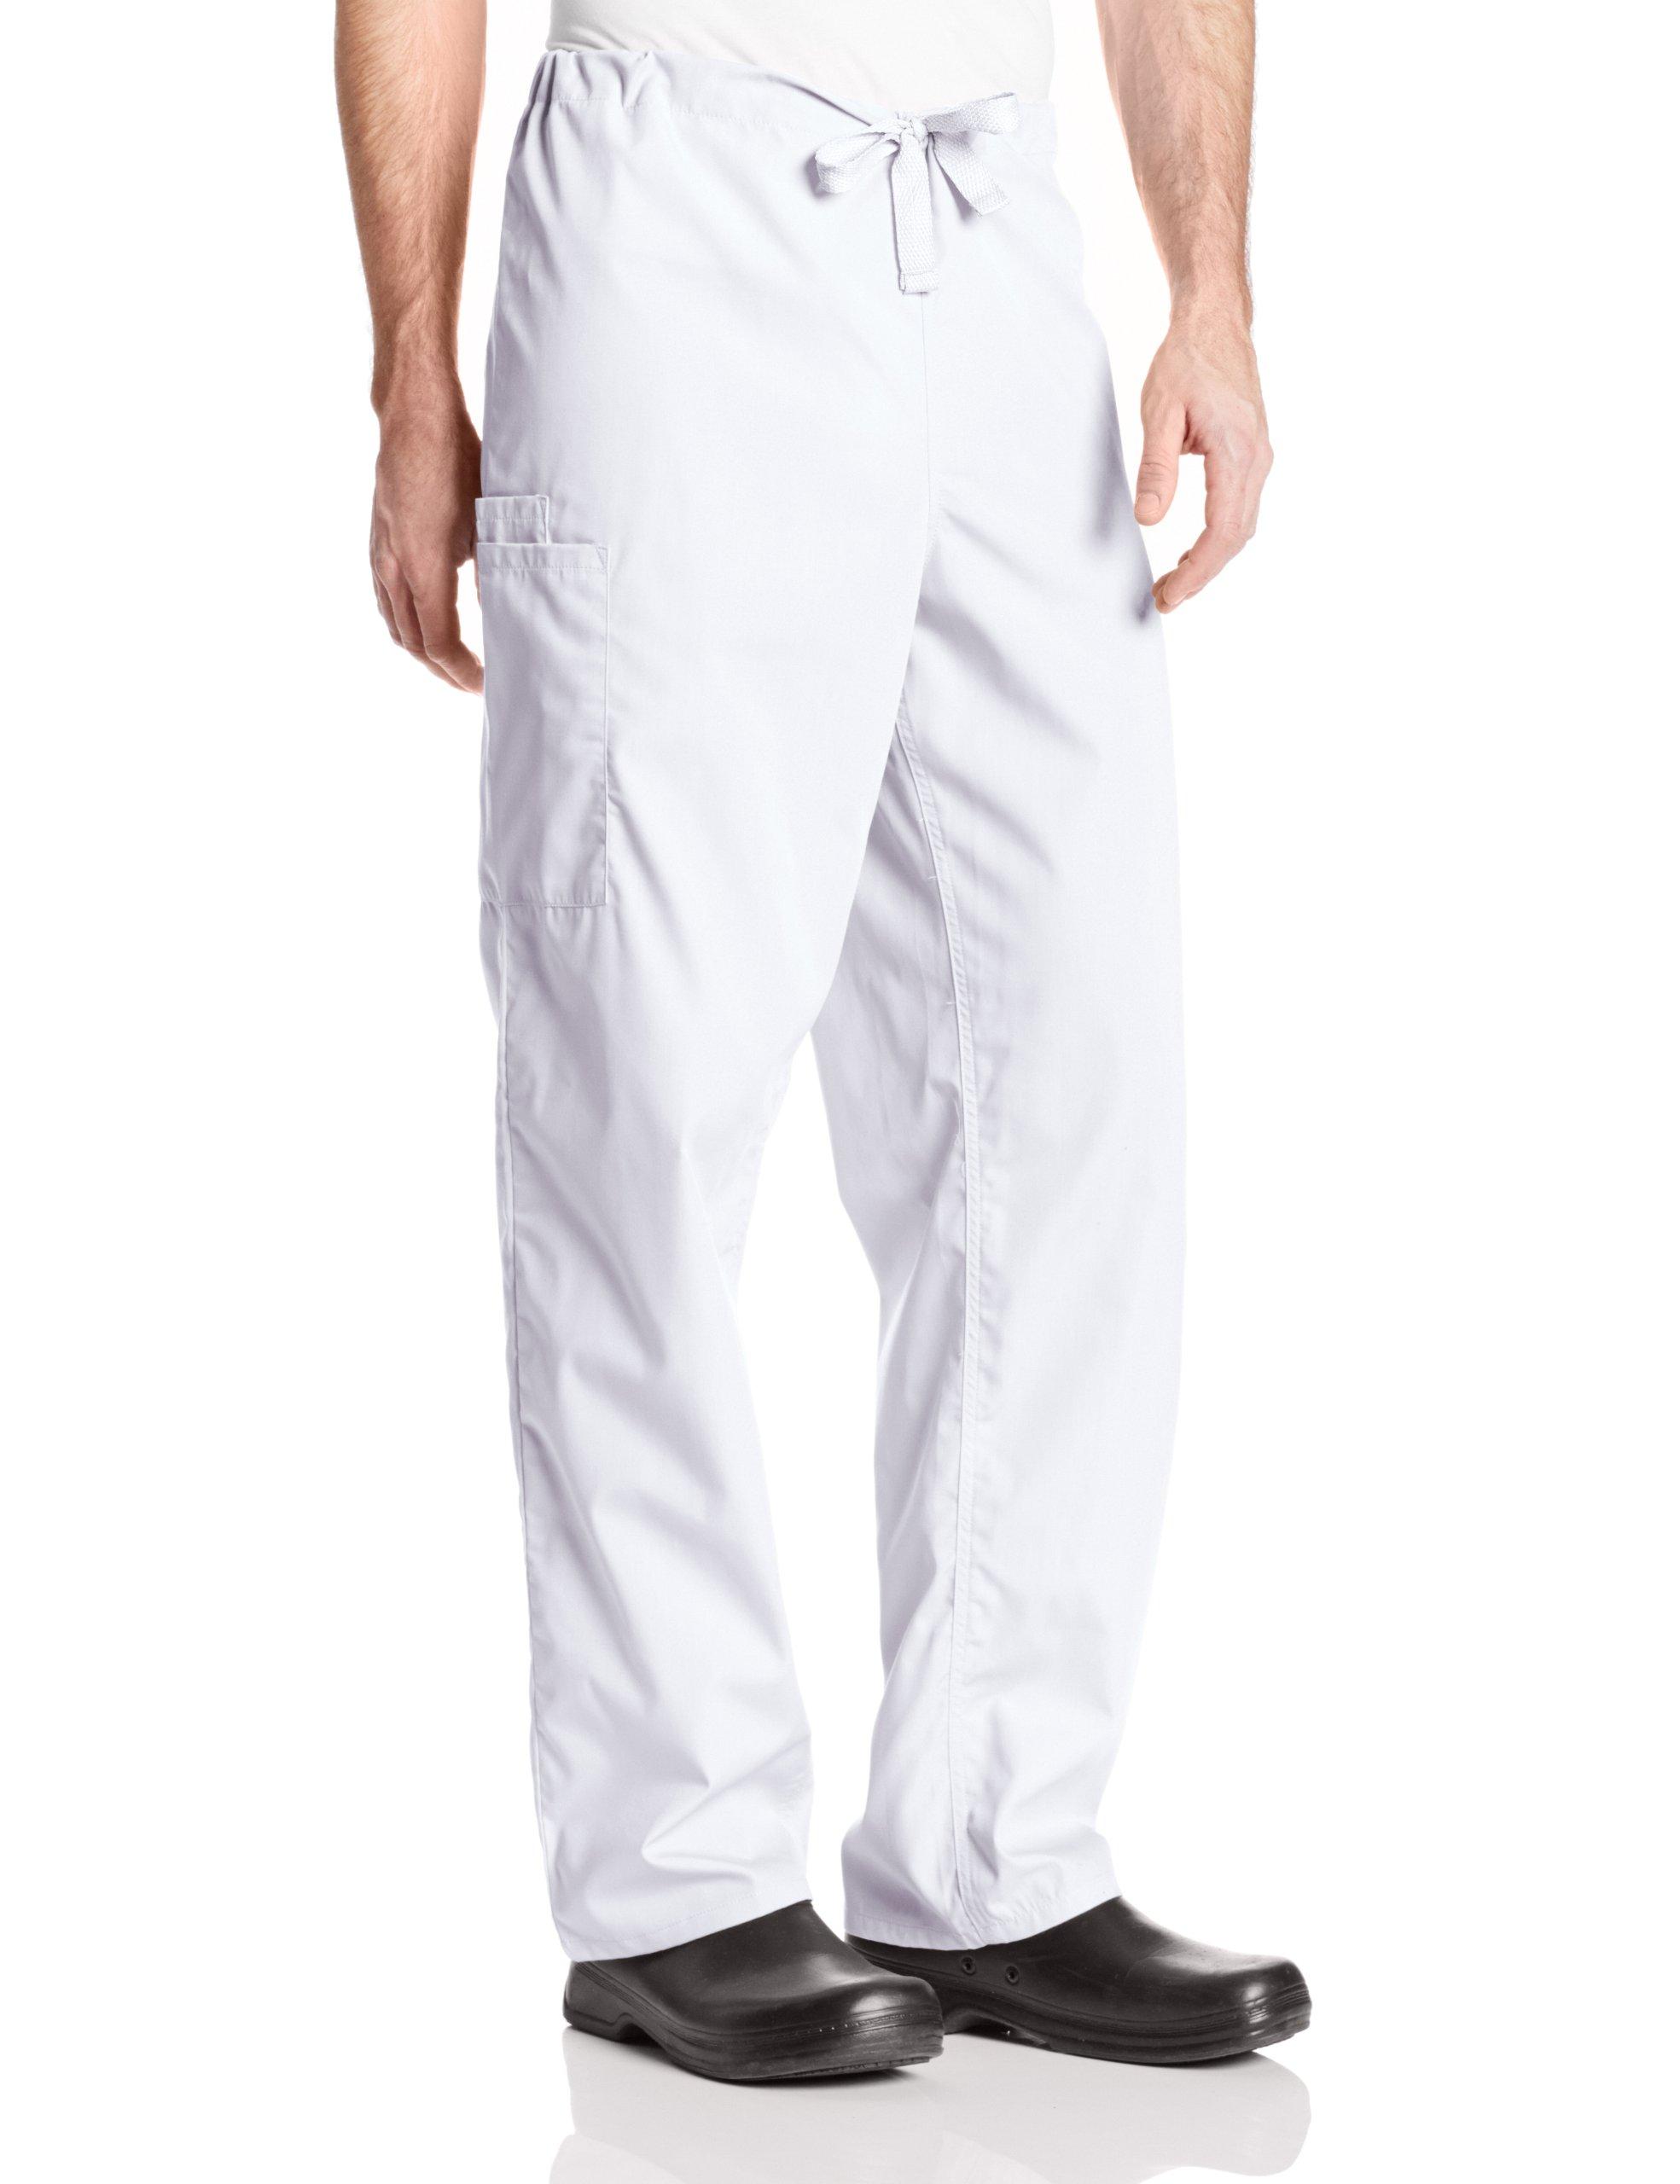 Cherokee Workwear Scrubs Unisex Cargo Pant, White, Medium by Cherokee (Image #1)